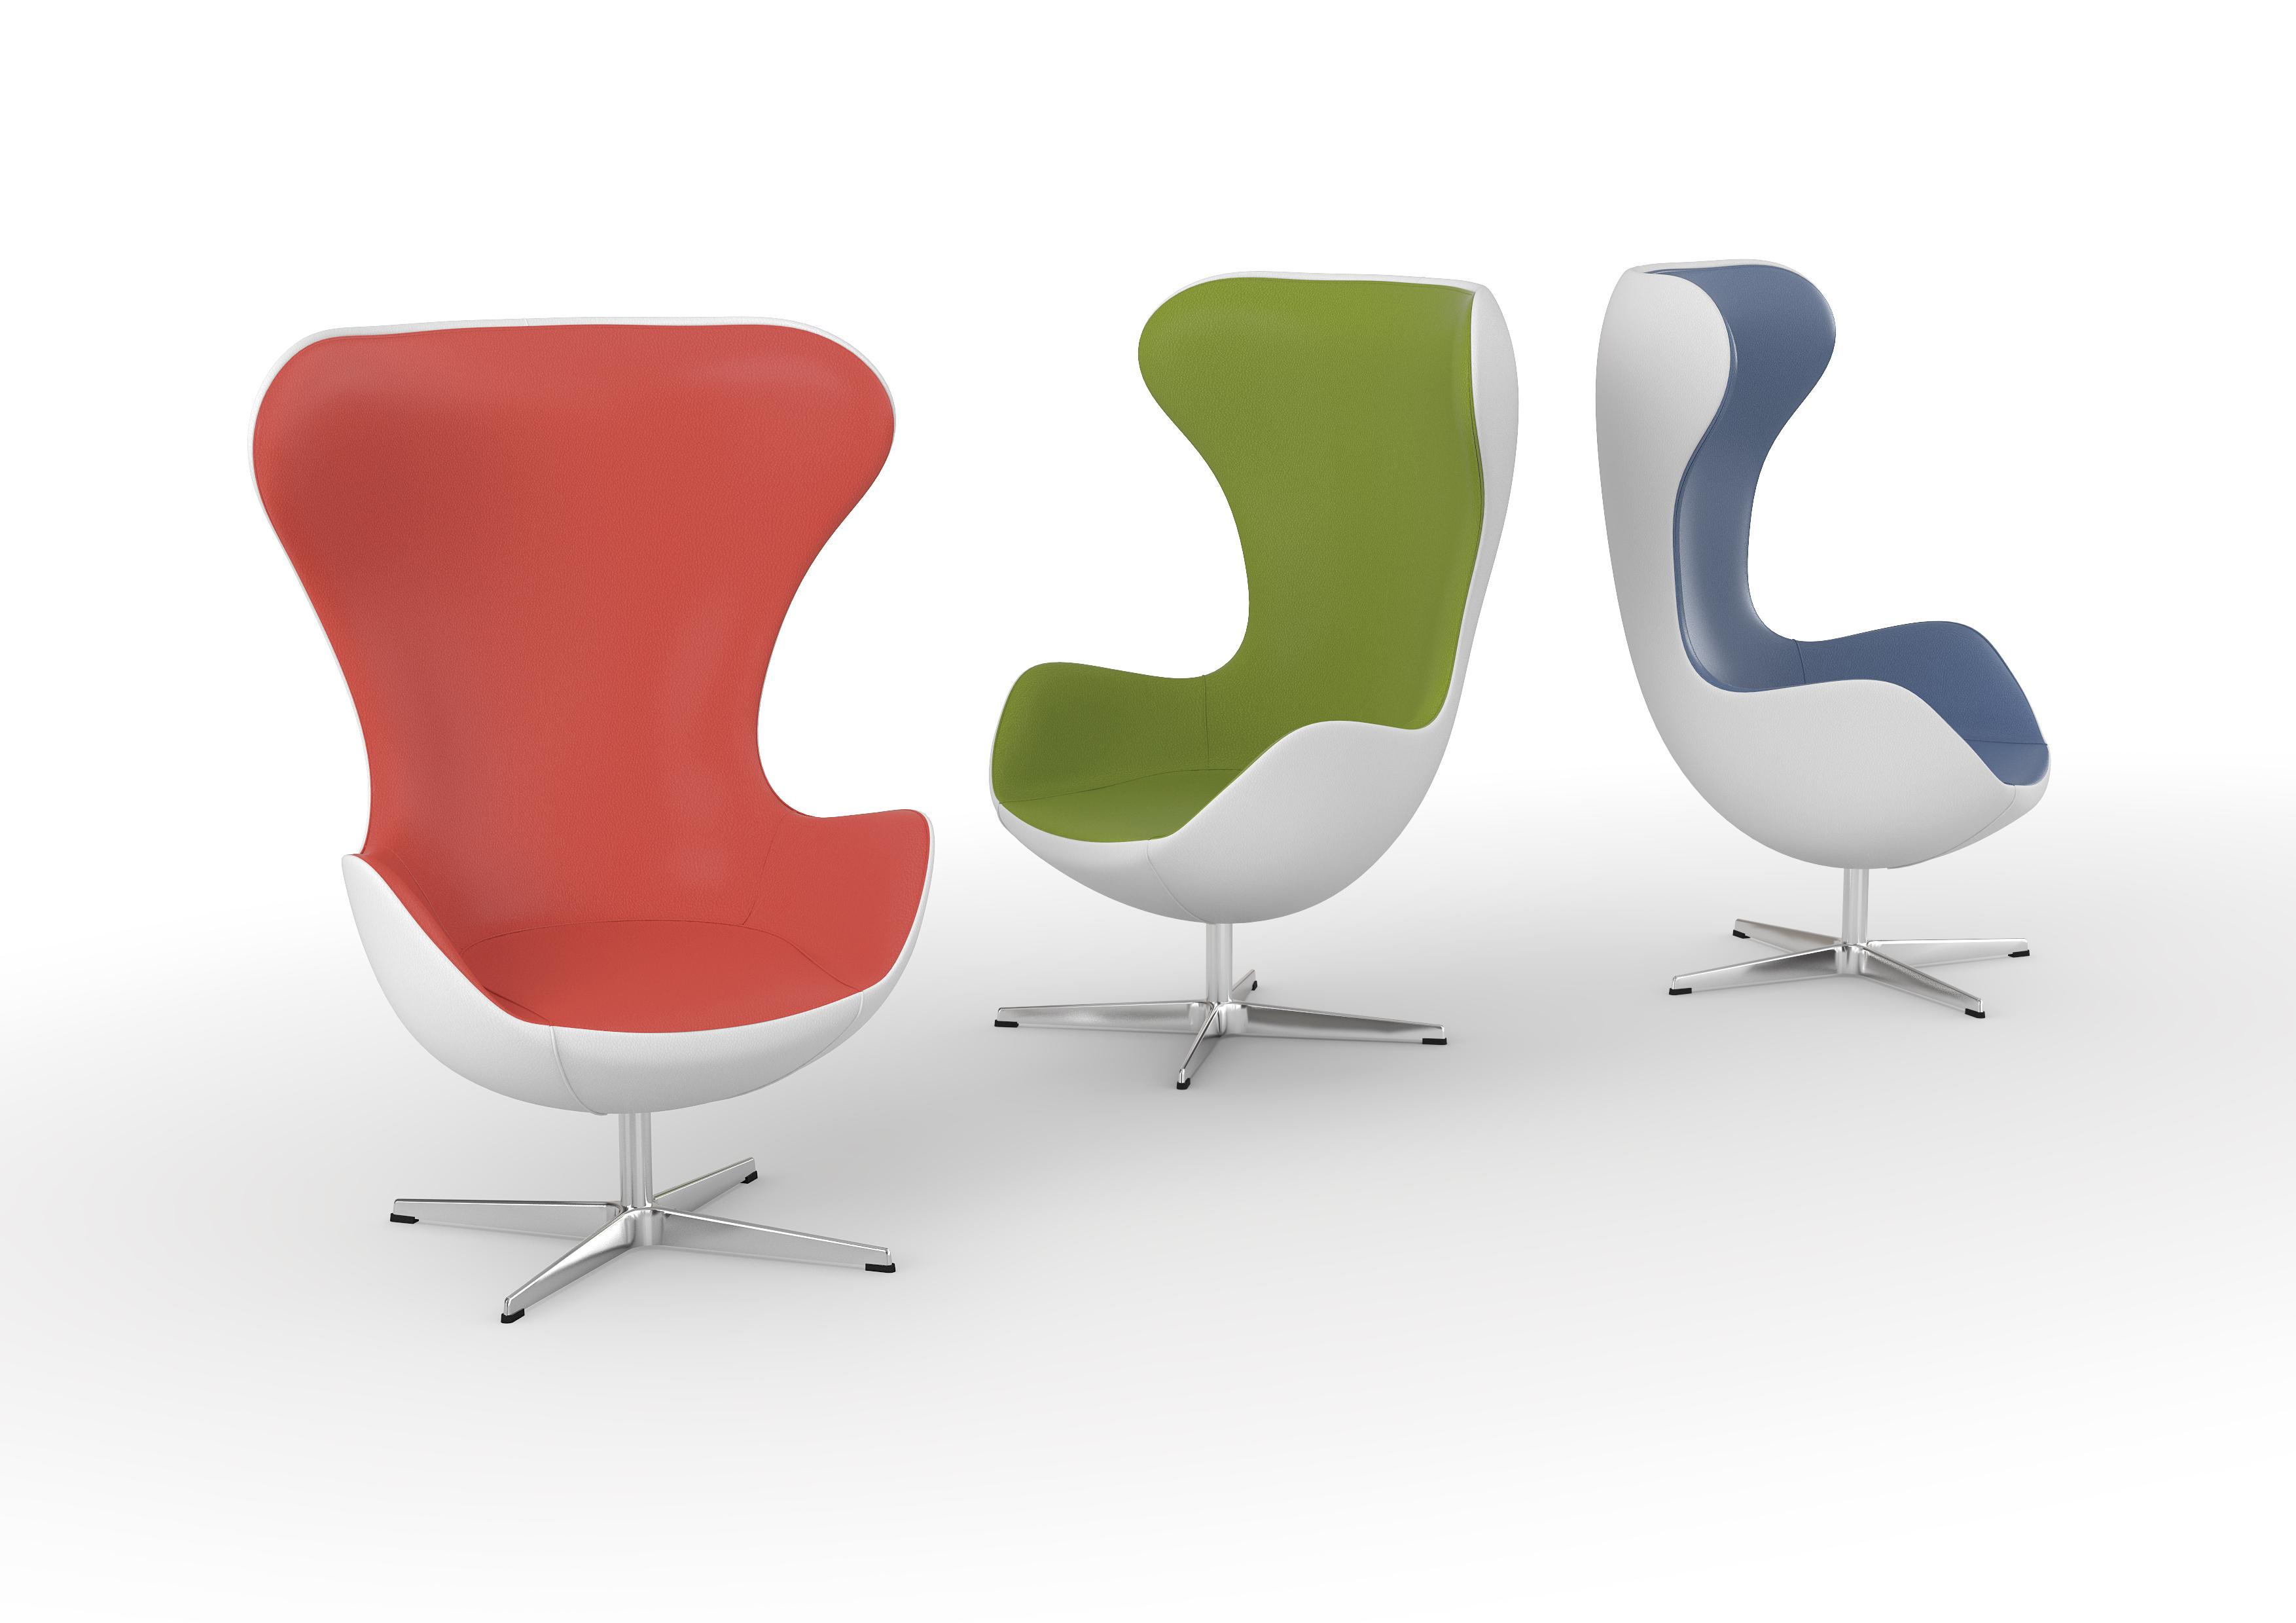 conjunto sillas mobiliario escolar